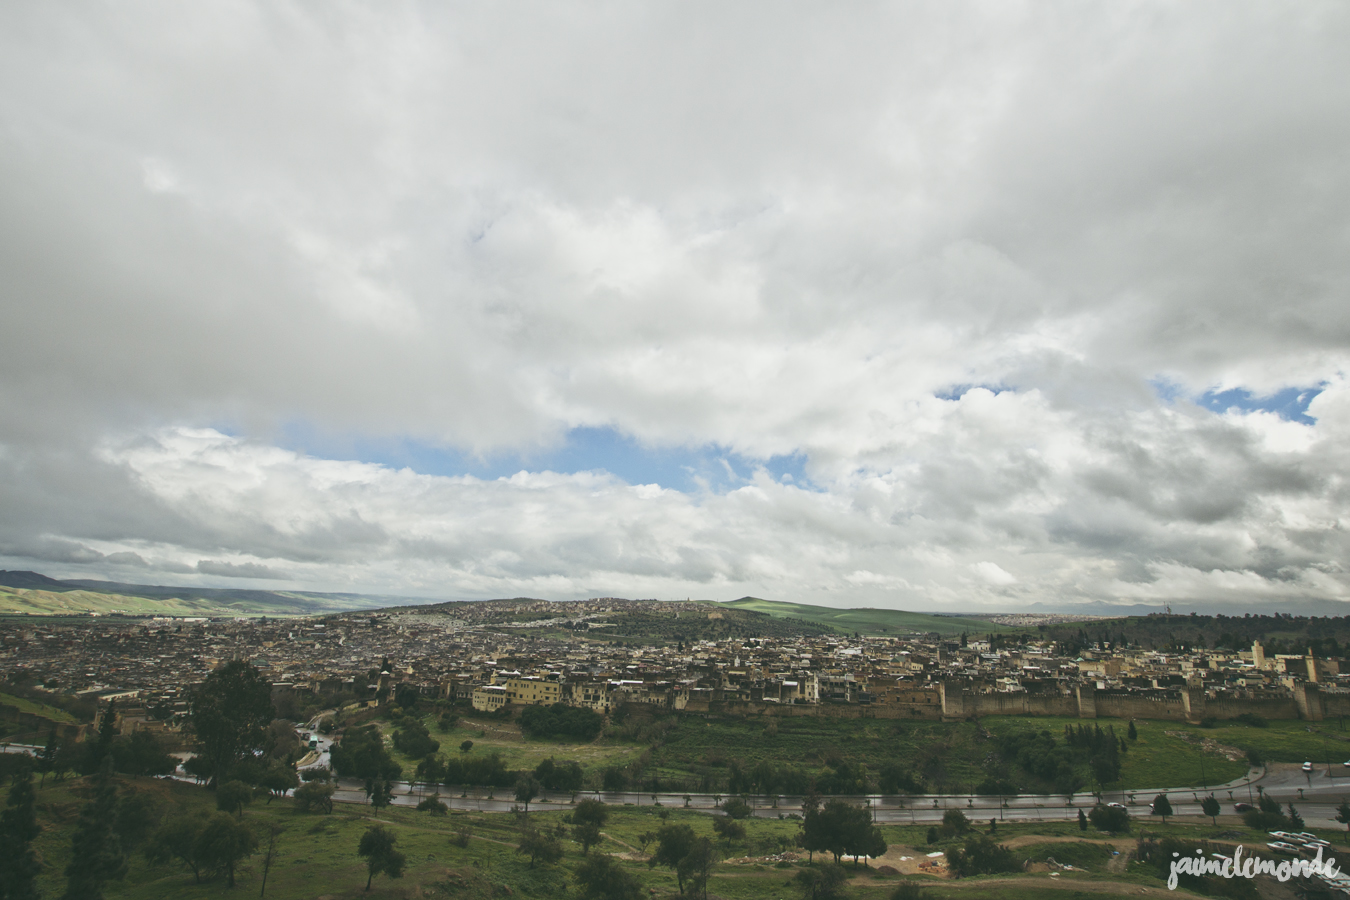 blog voyage - 50 photos à Fès - Maroc - ©jaimelemonde (27)